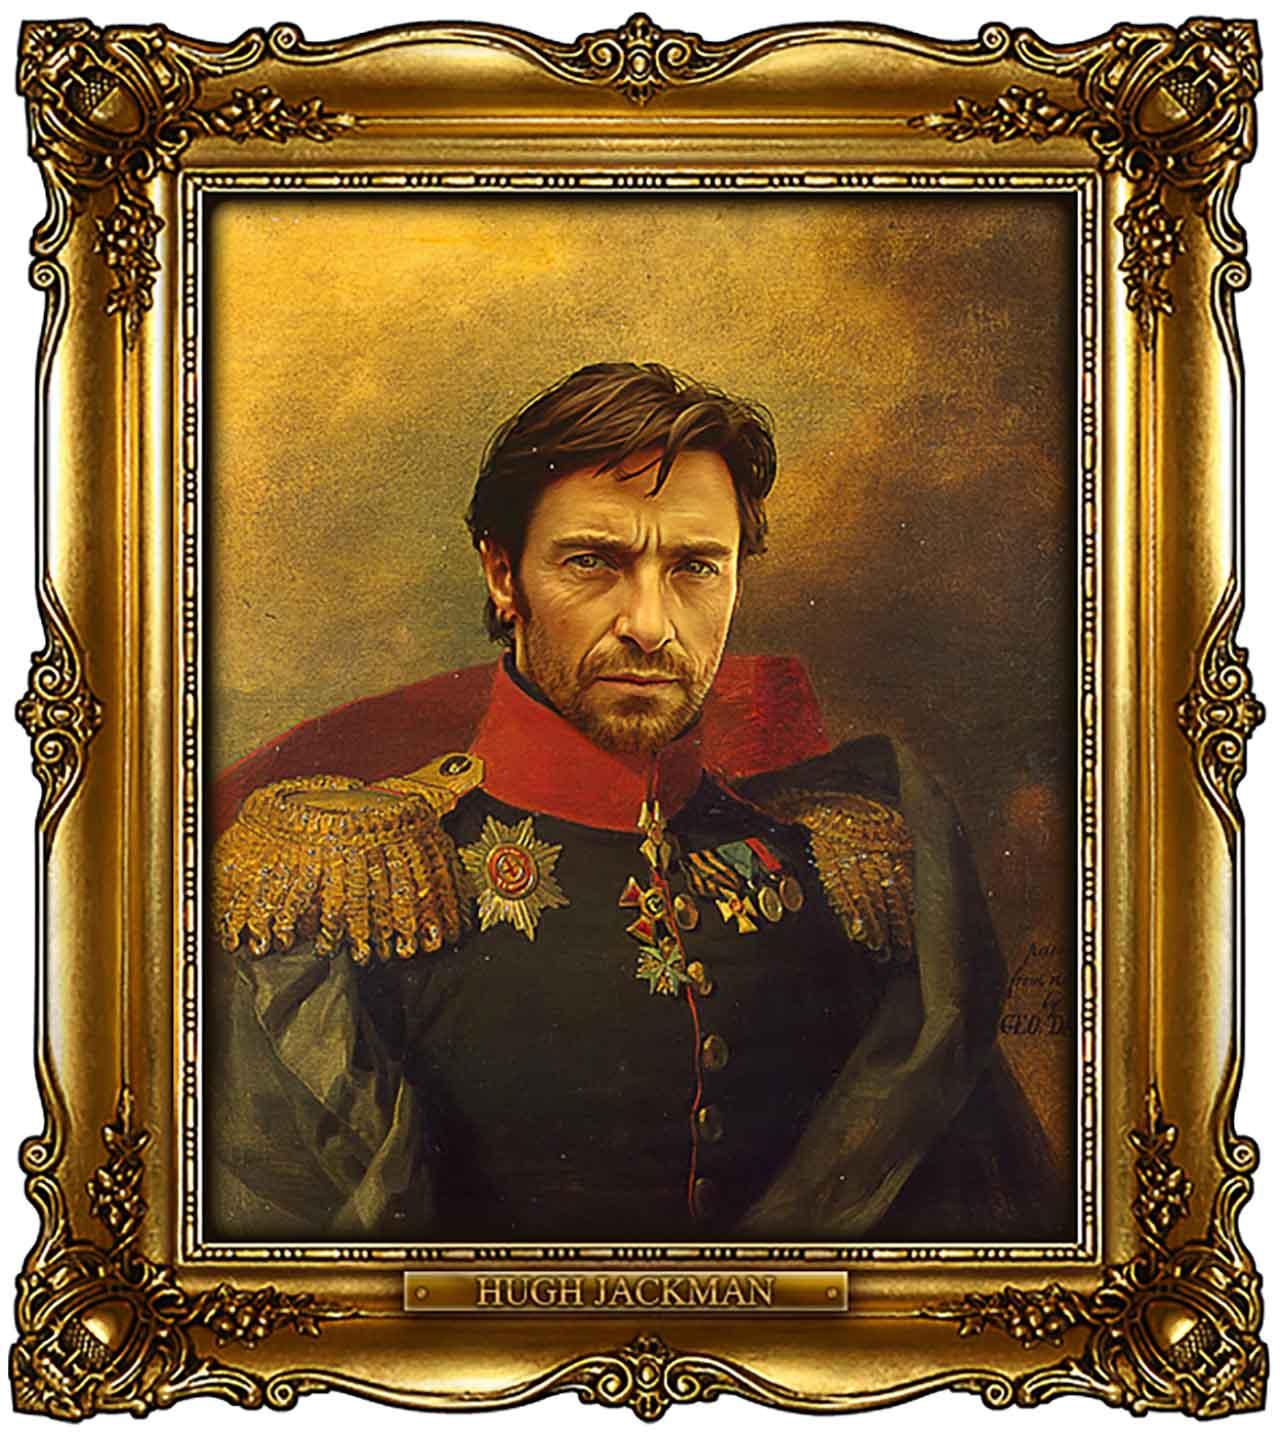 Artist Turns Famous Actors Into Russian Generals - Hugh Jackman